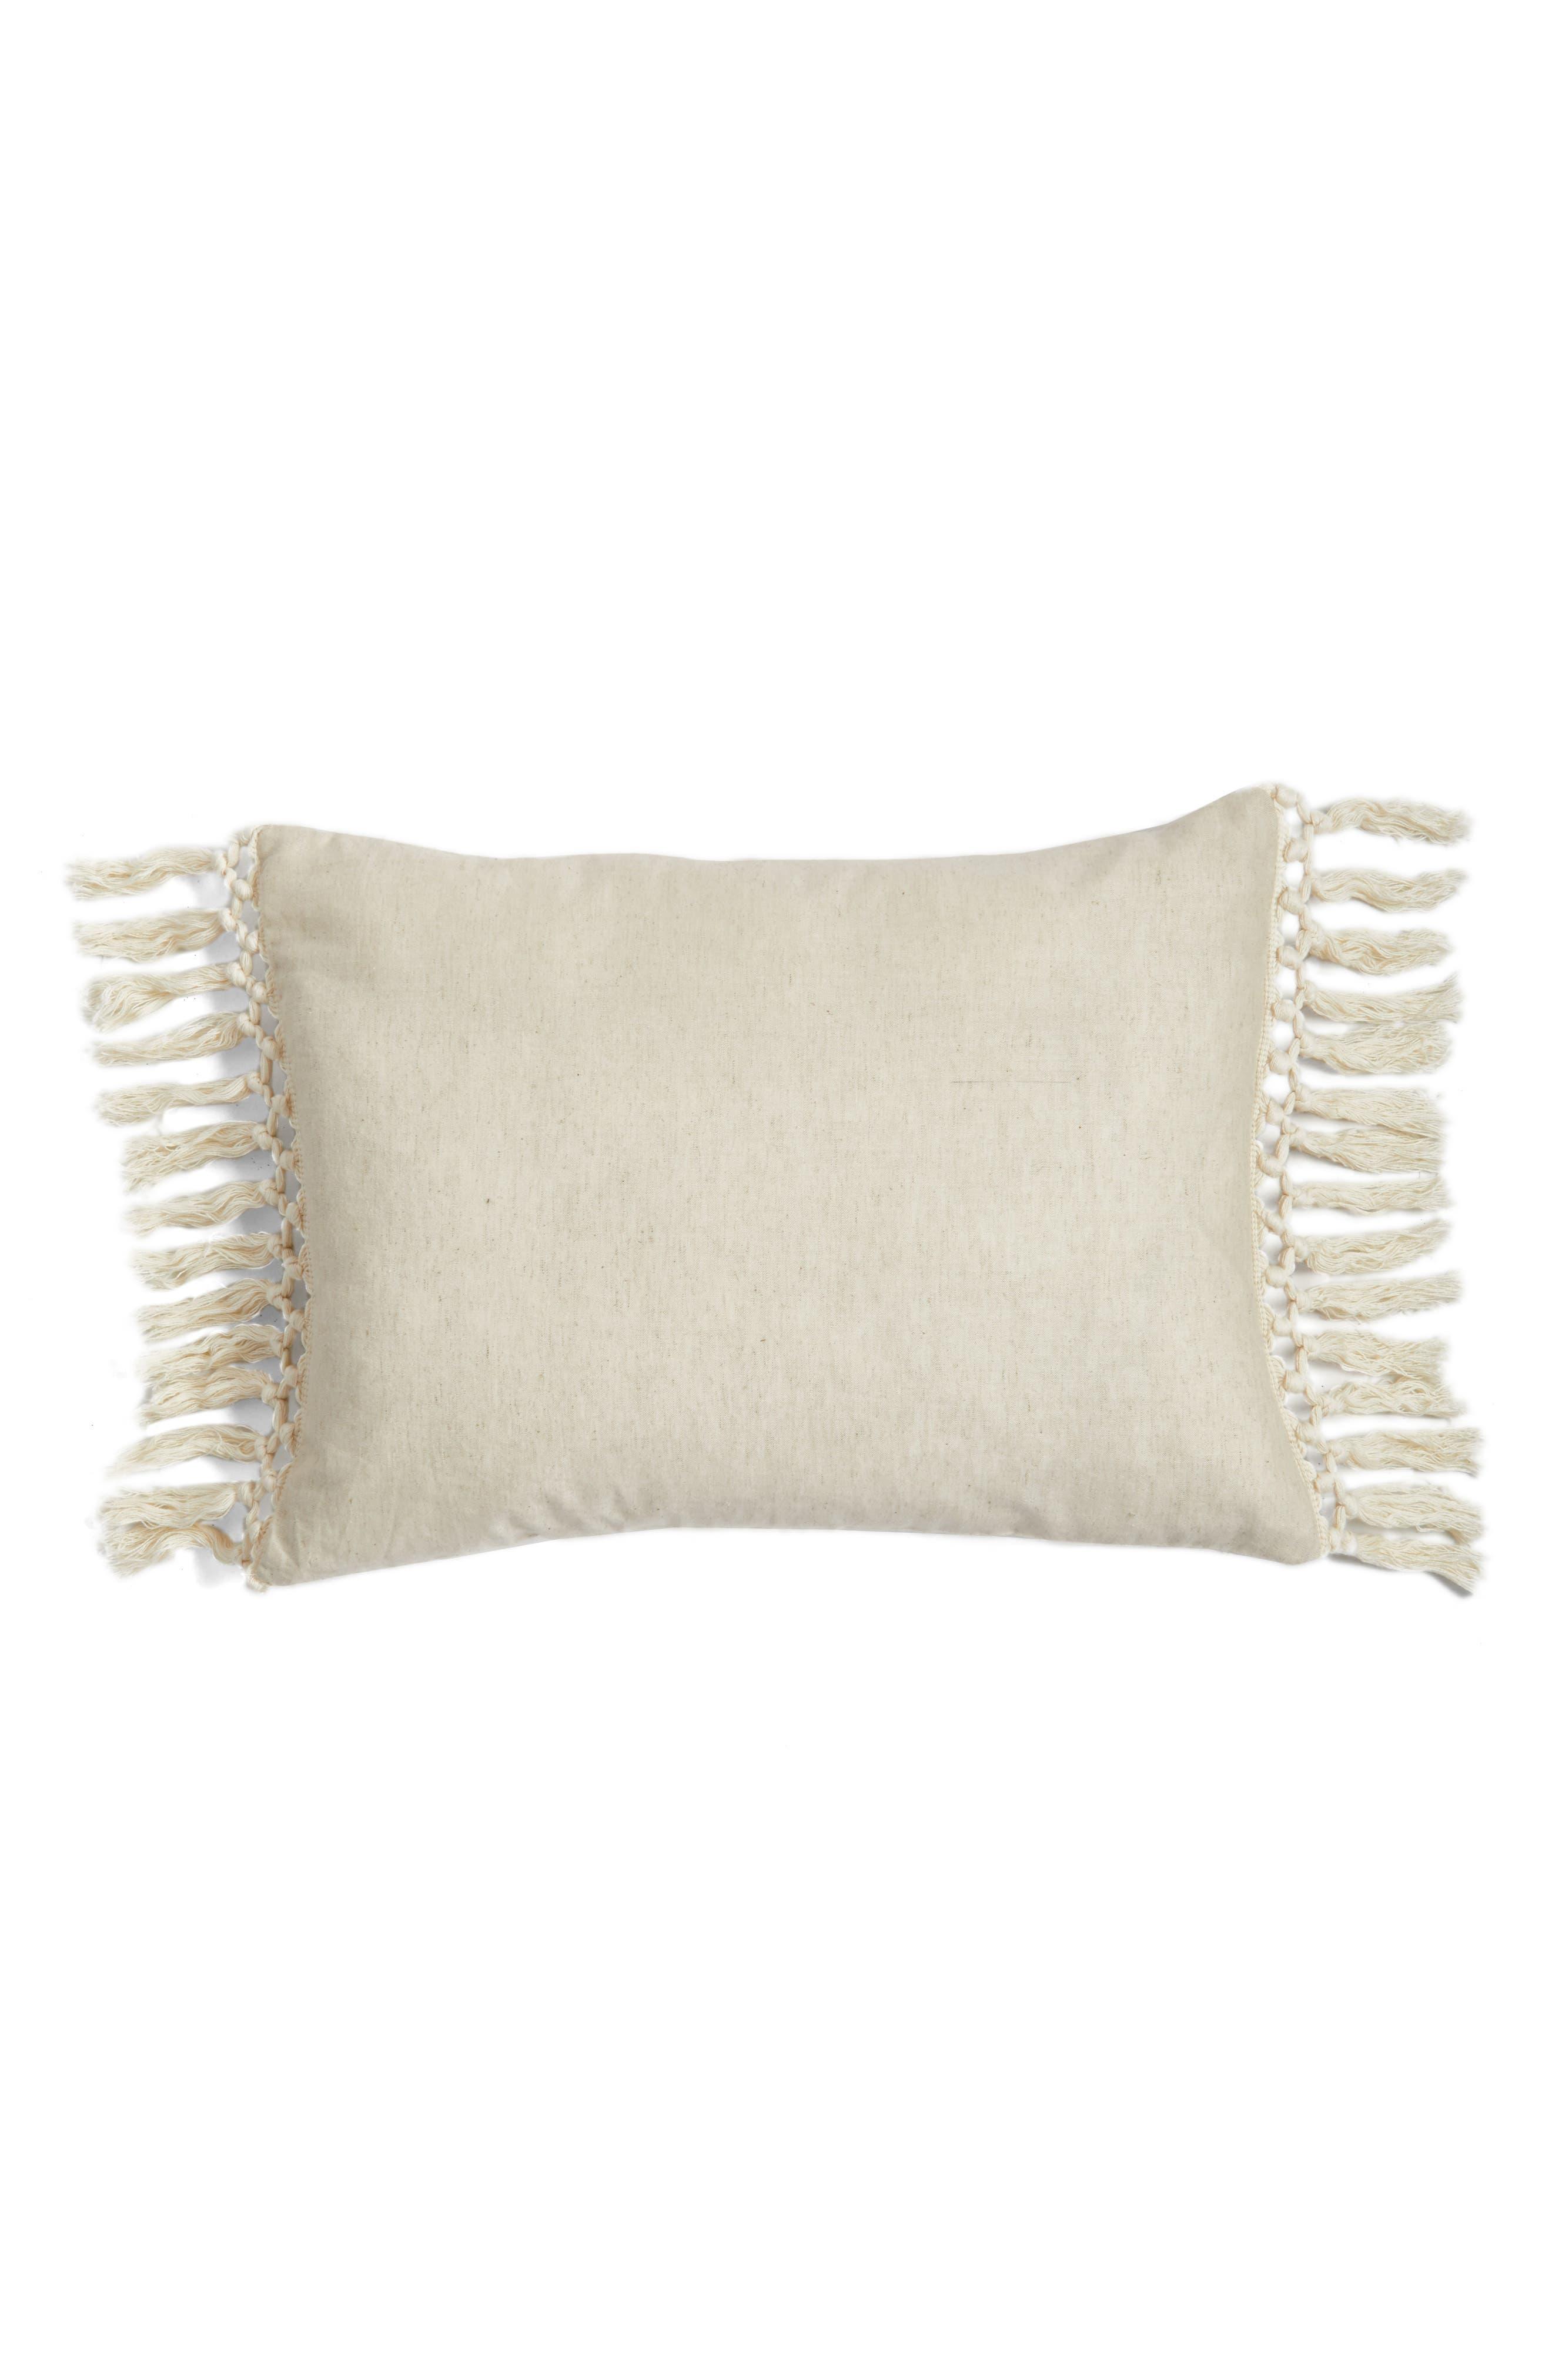 Mamaste Accent Pillow,                             Alternate thumbnail 2, color,                             250